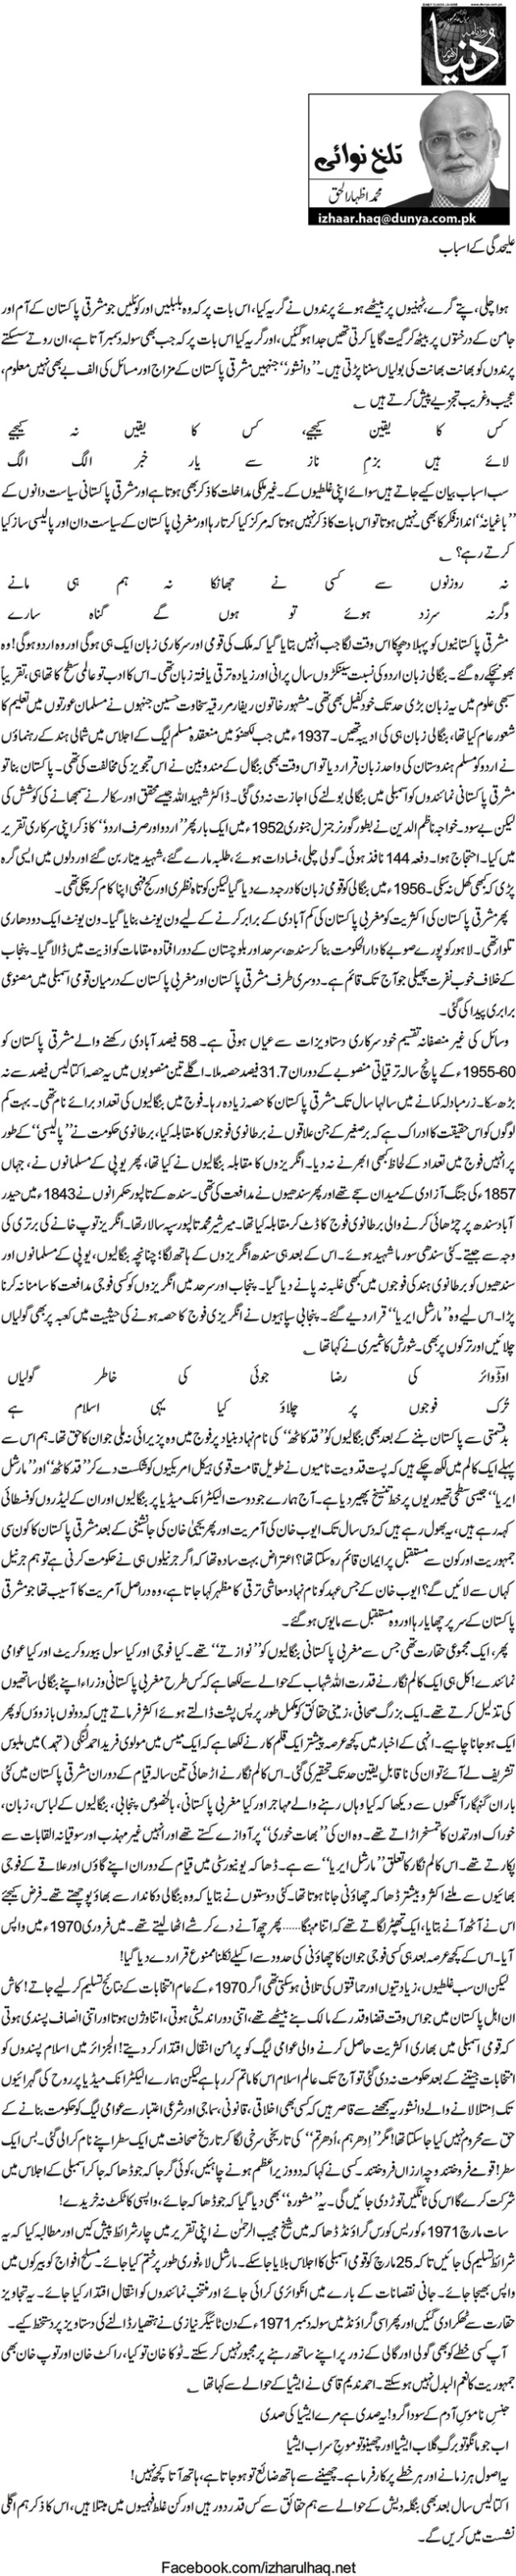 Alaihidgi k asbab - M. Izhar ul Haq